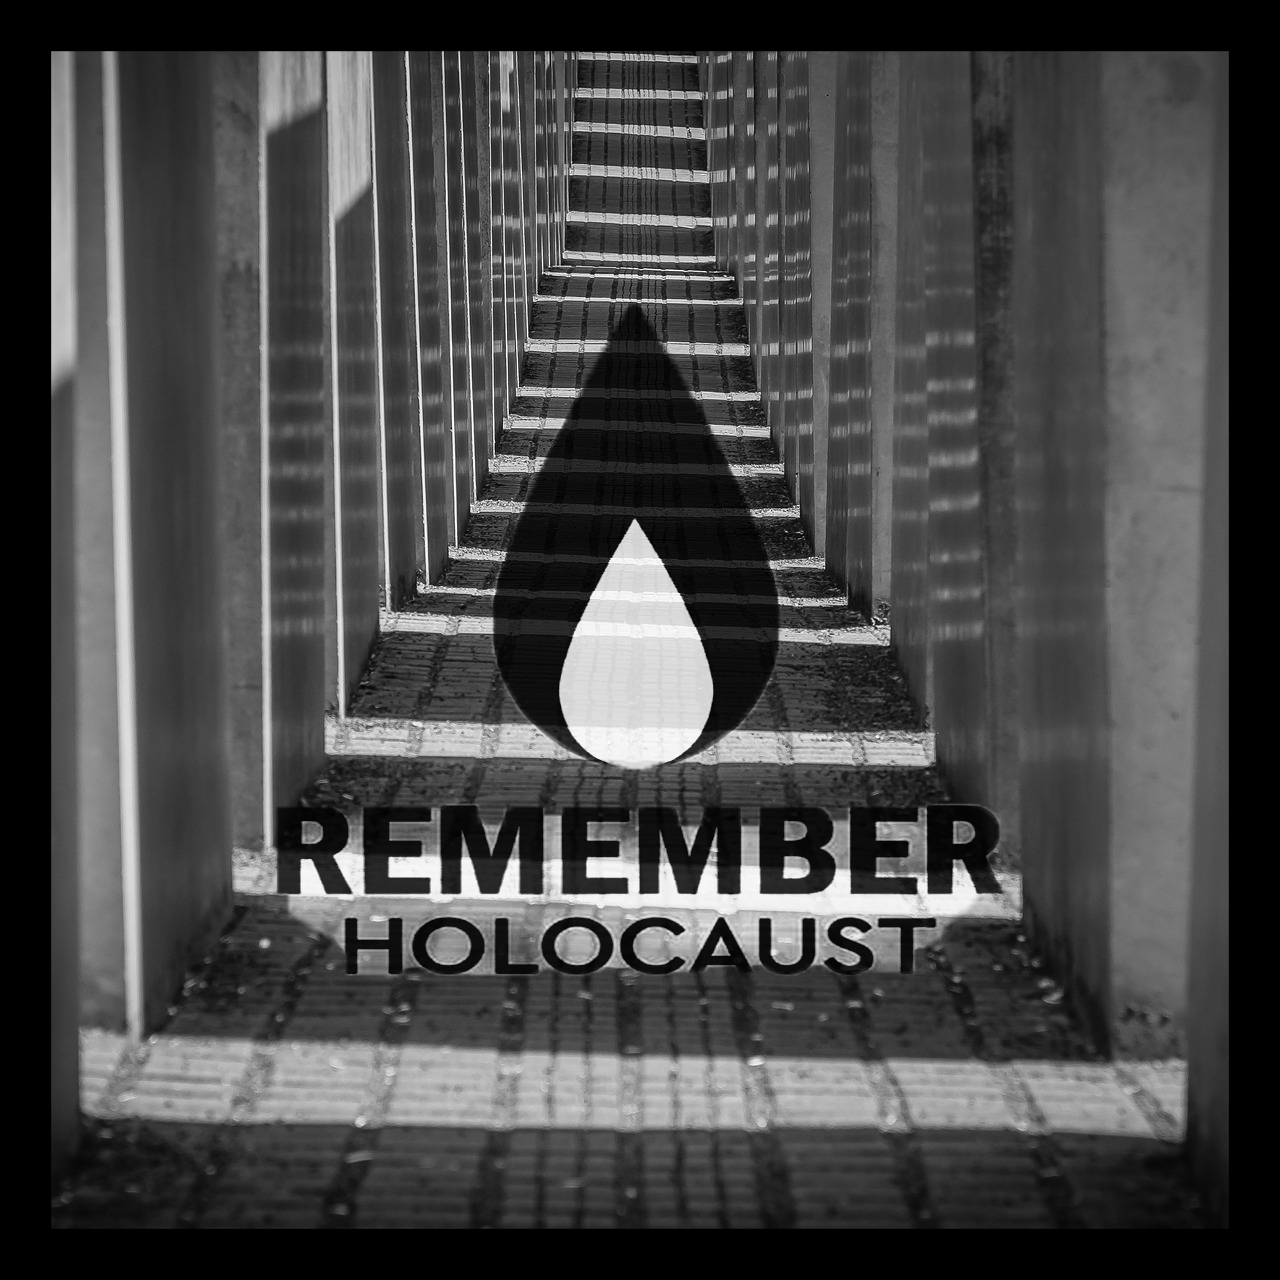 Remember Holocaust